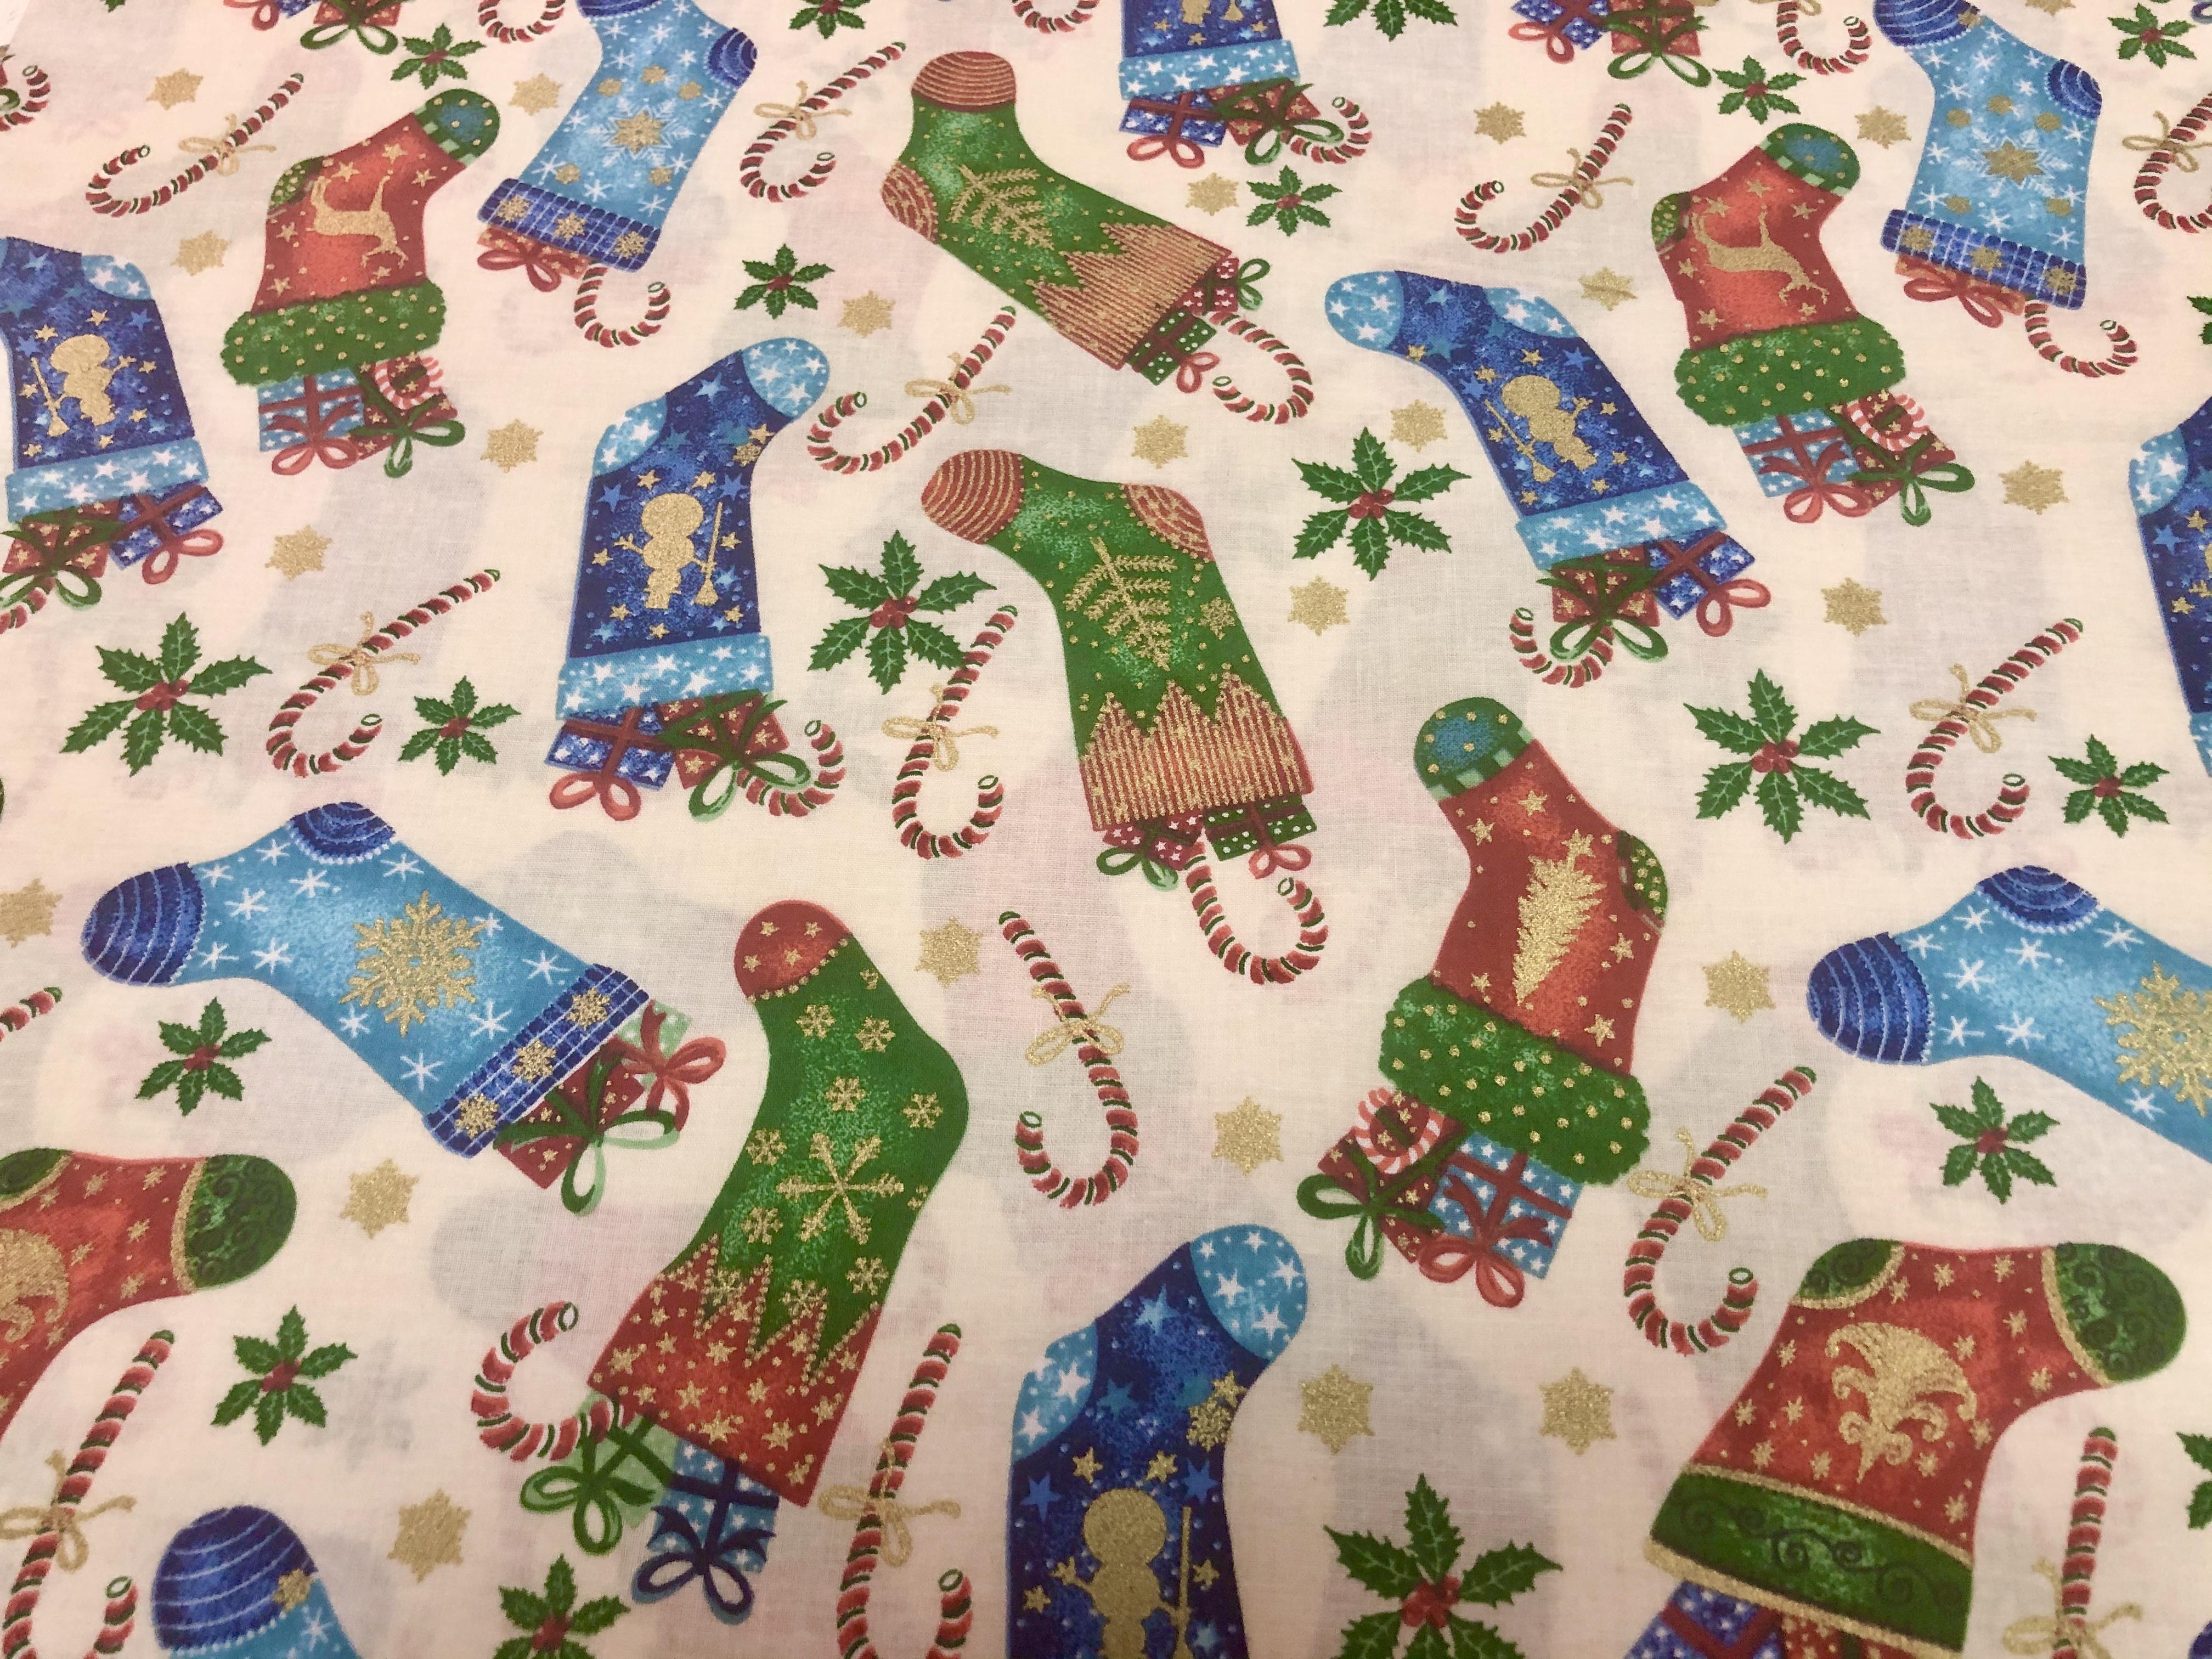 Merry Christmas Metallics - Stockings - 1/2m cut 56385